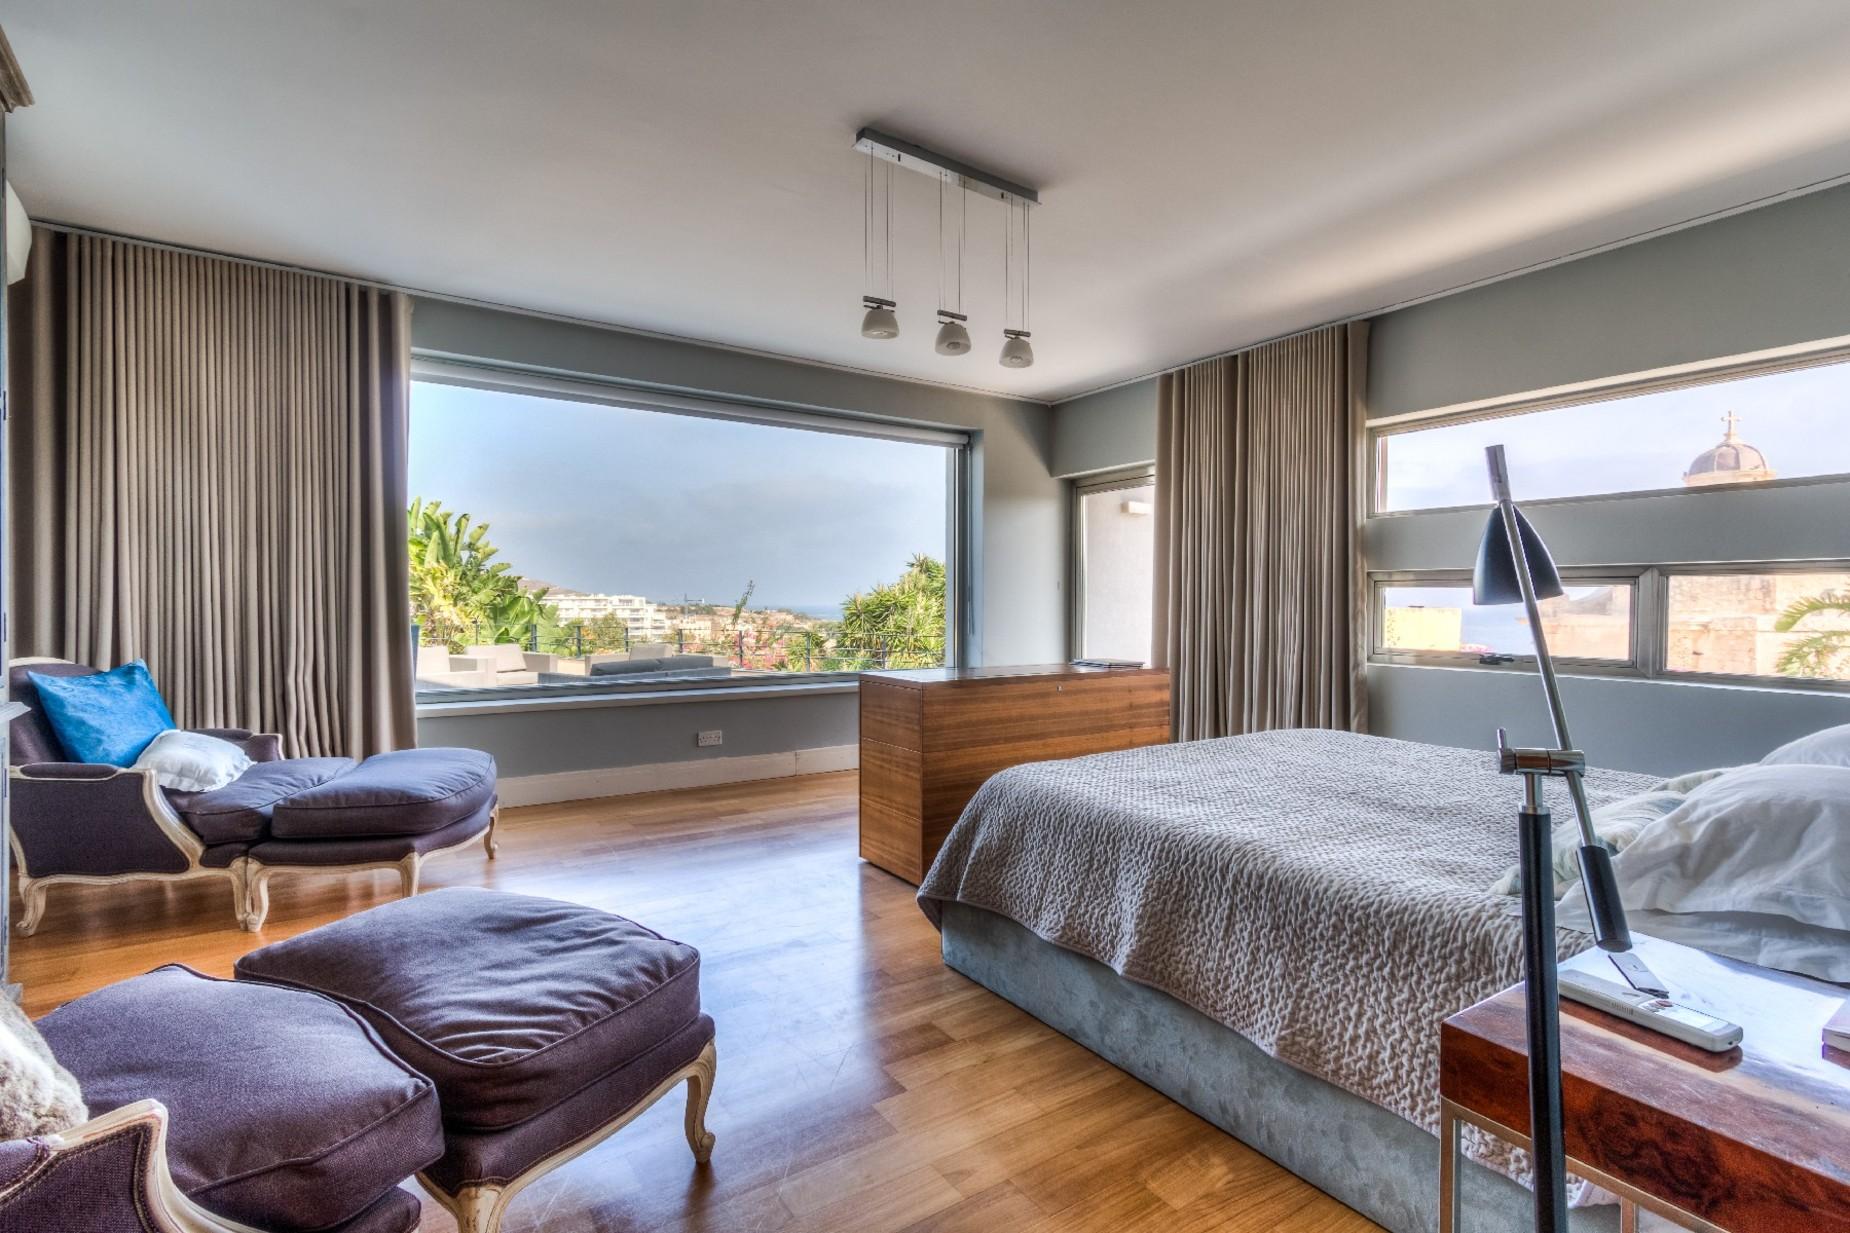 7 bed Villa For Sale in Bahar ic-Caghaq, Bahar ic-Caghaq - thumb 10